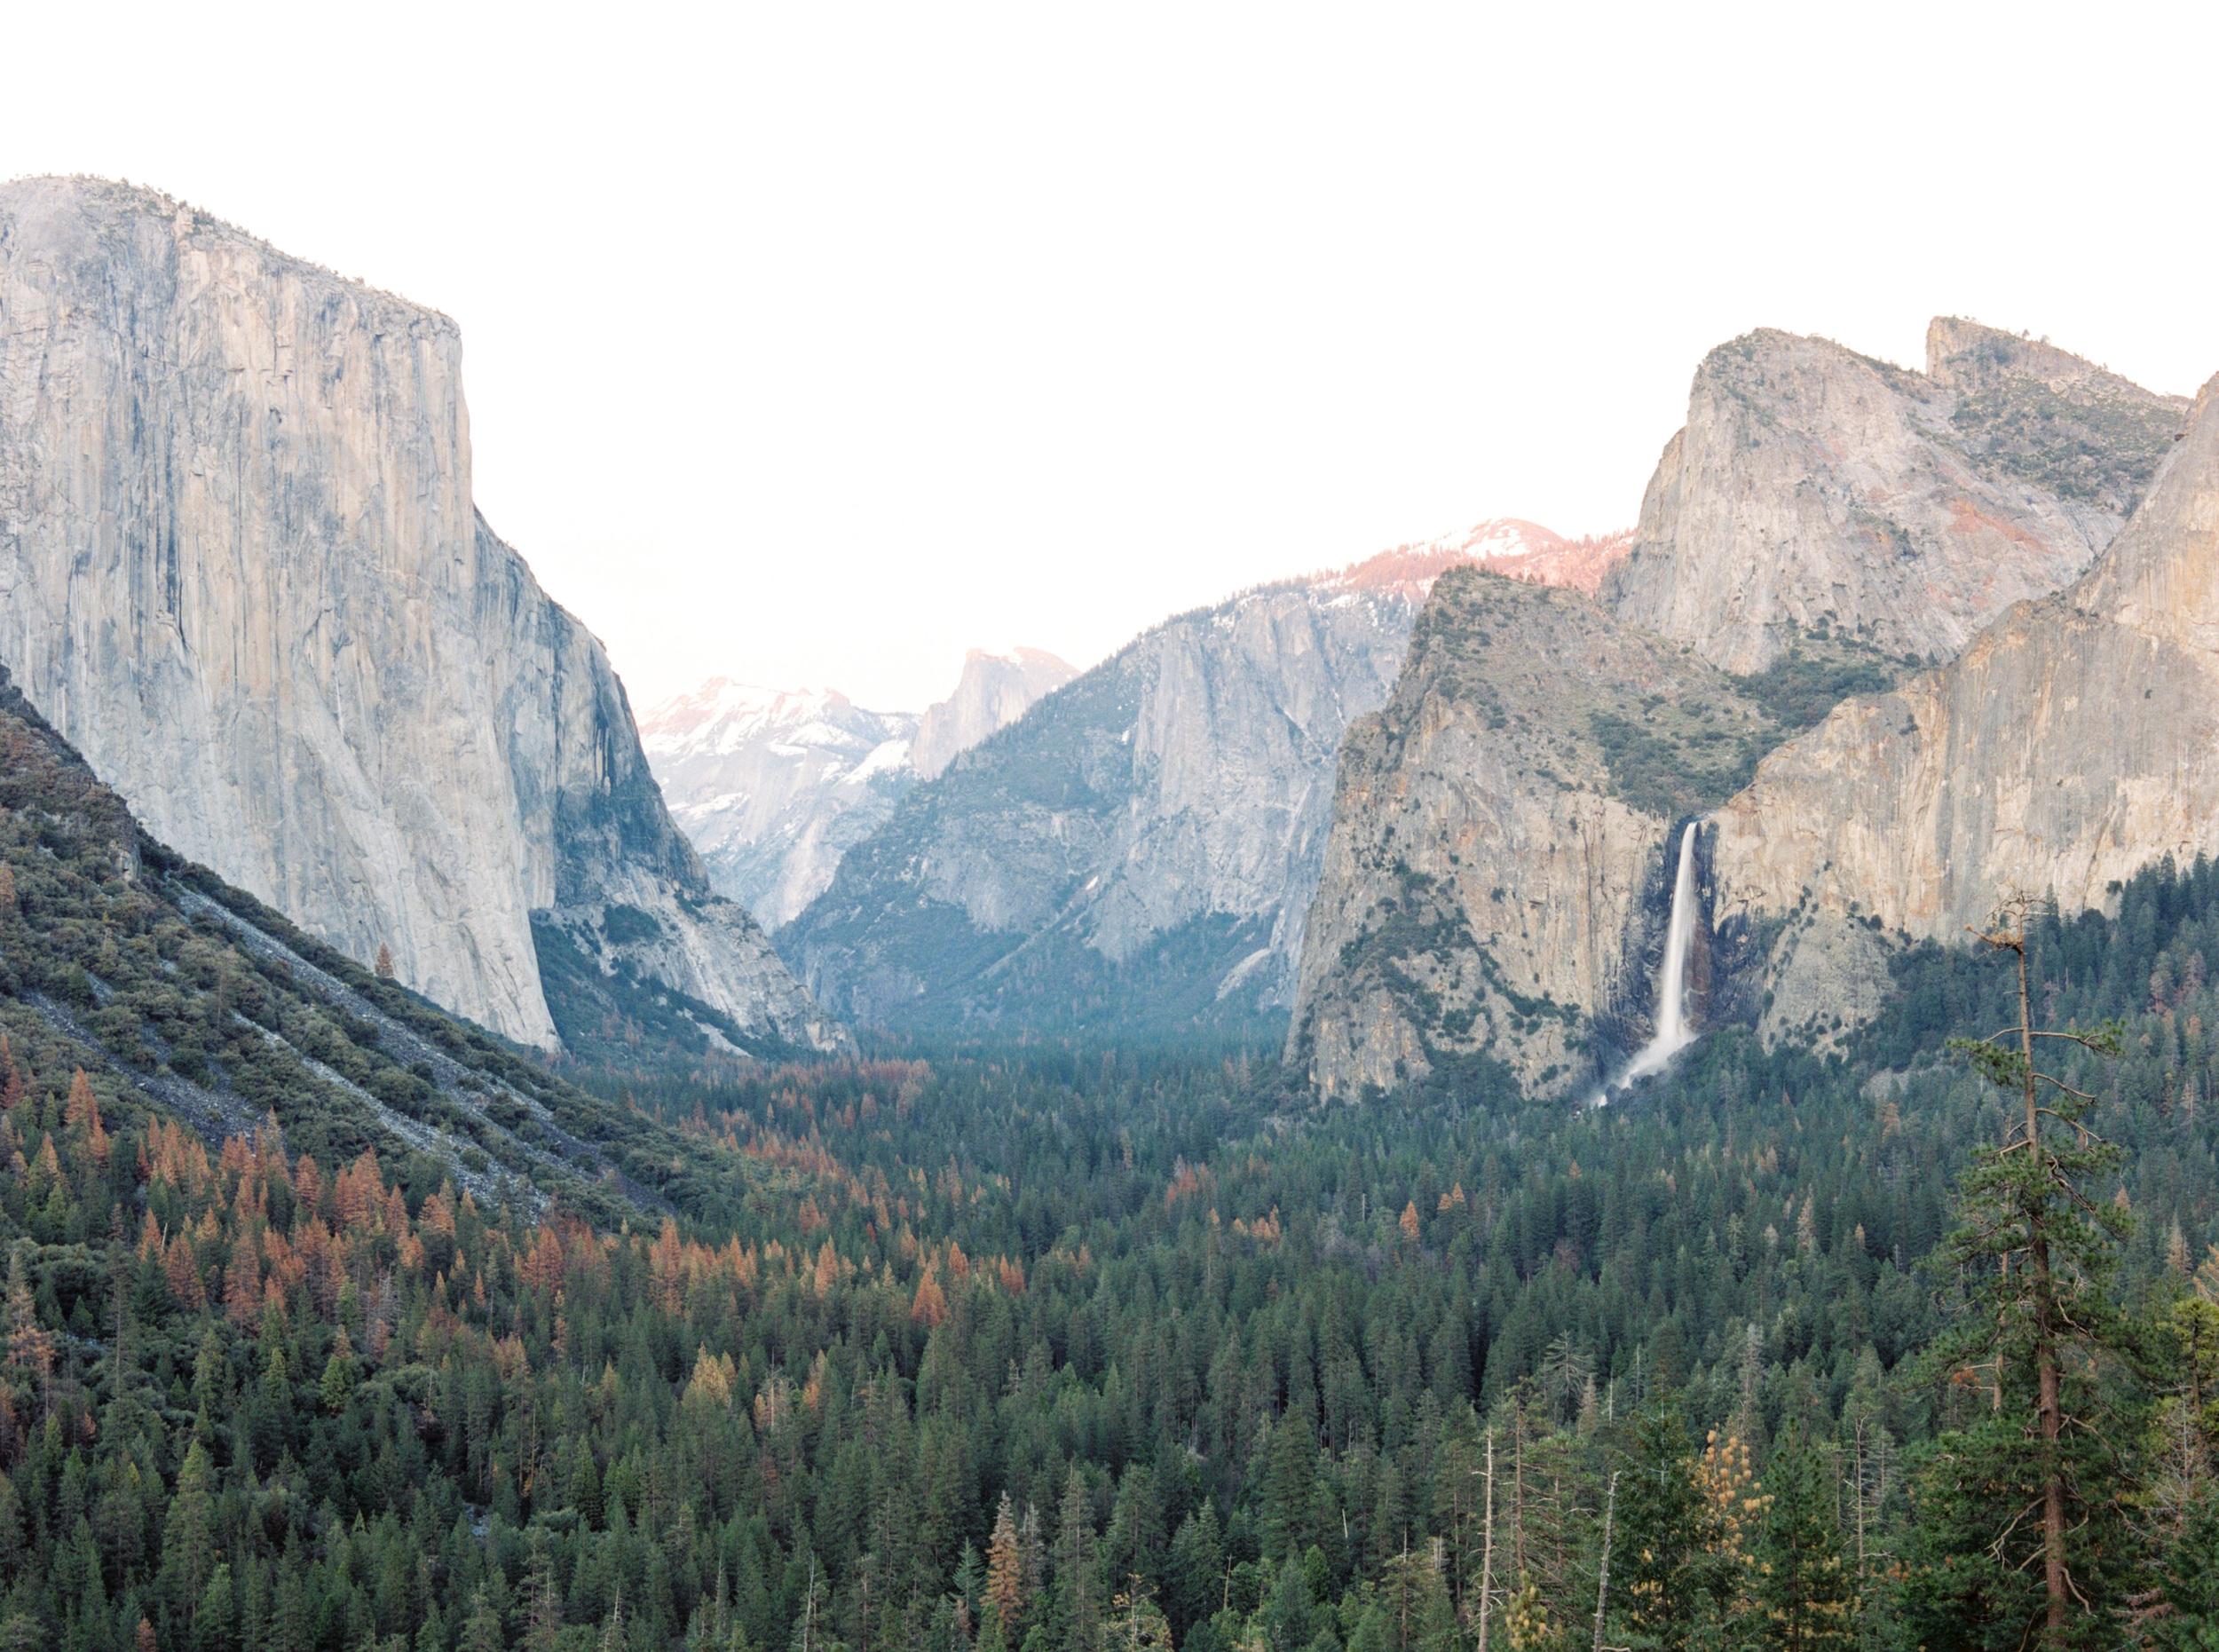 Yosemite_national_park_engagement_shoot_film-58.jpg